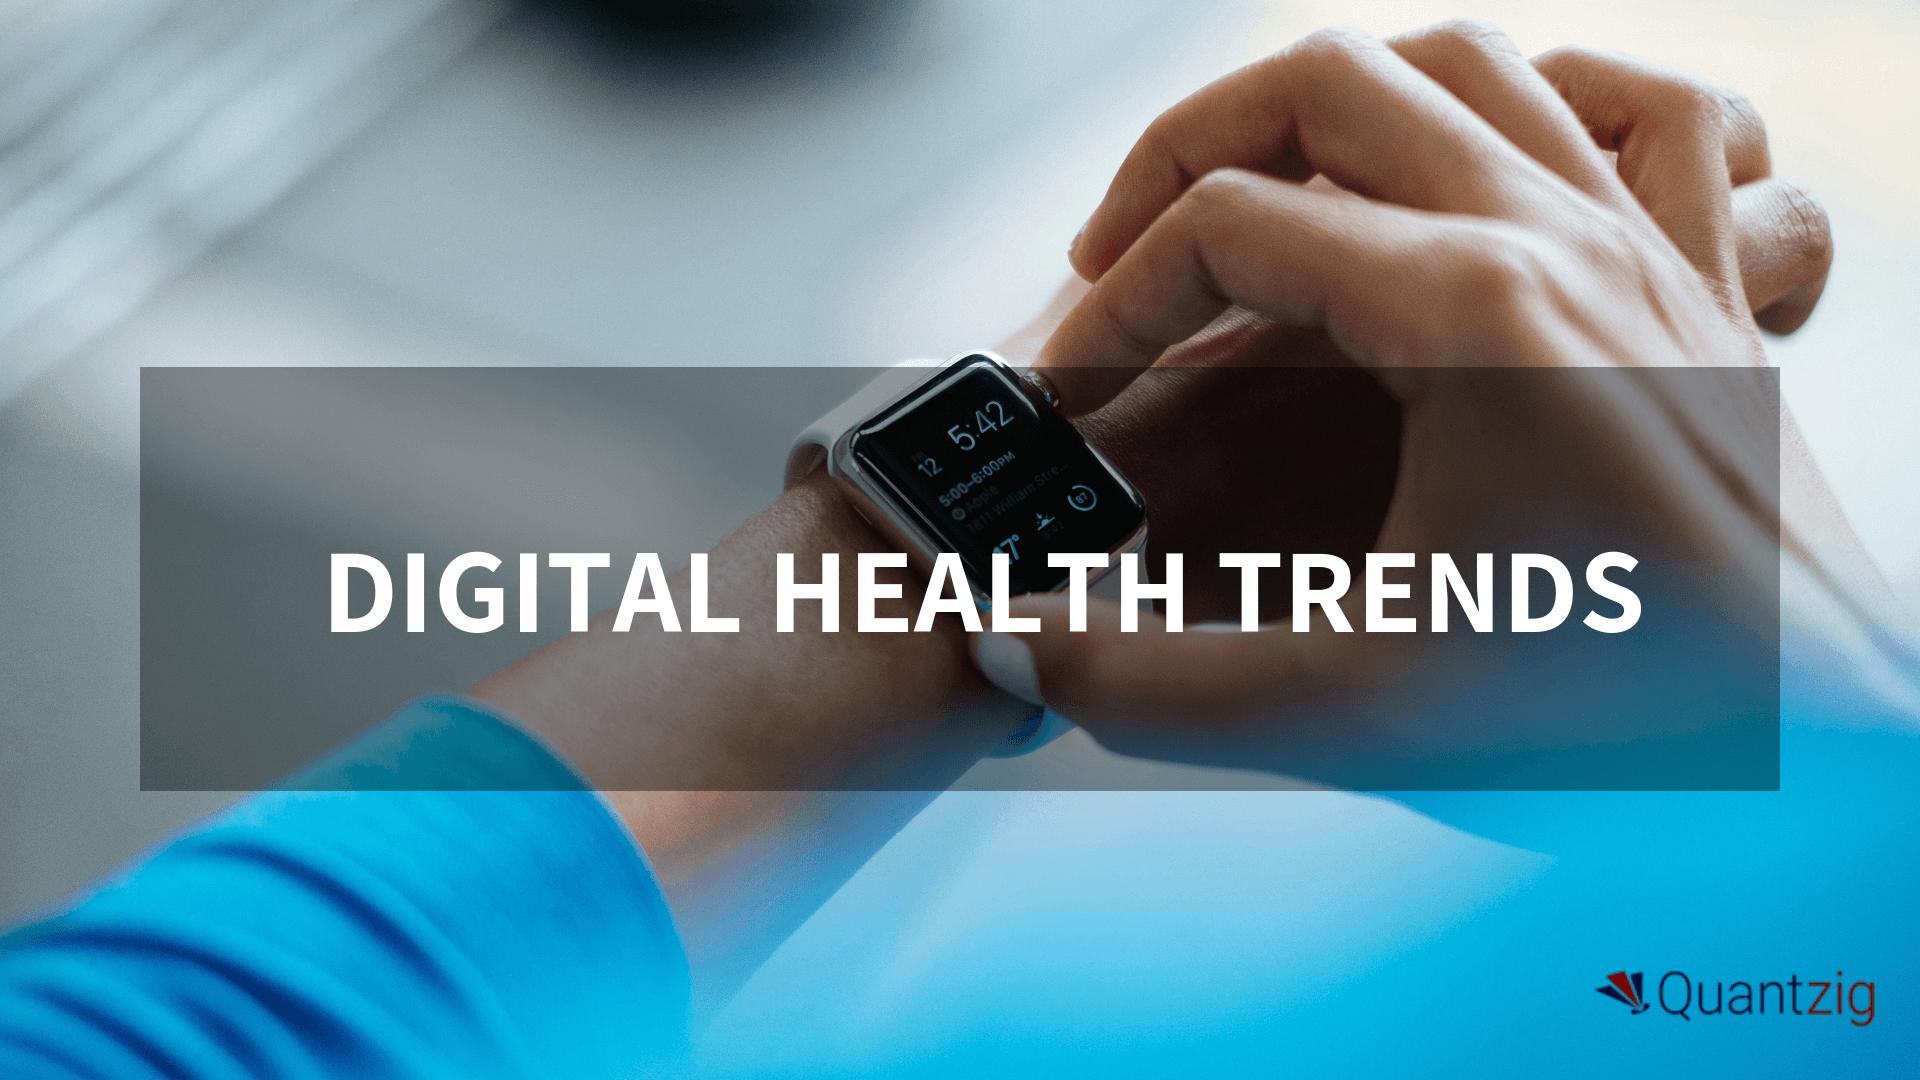 Digital Health Trends